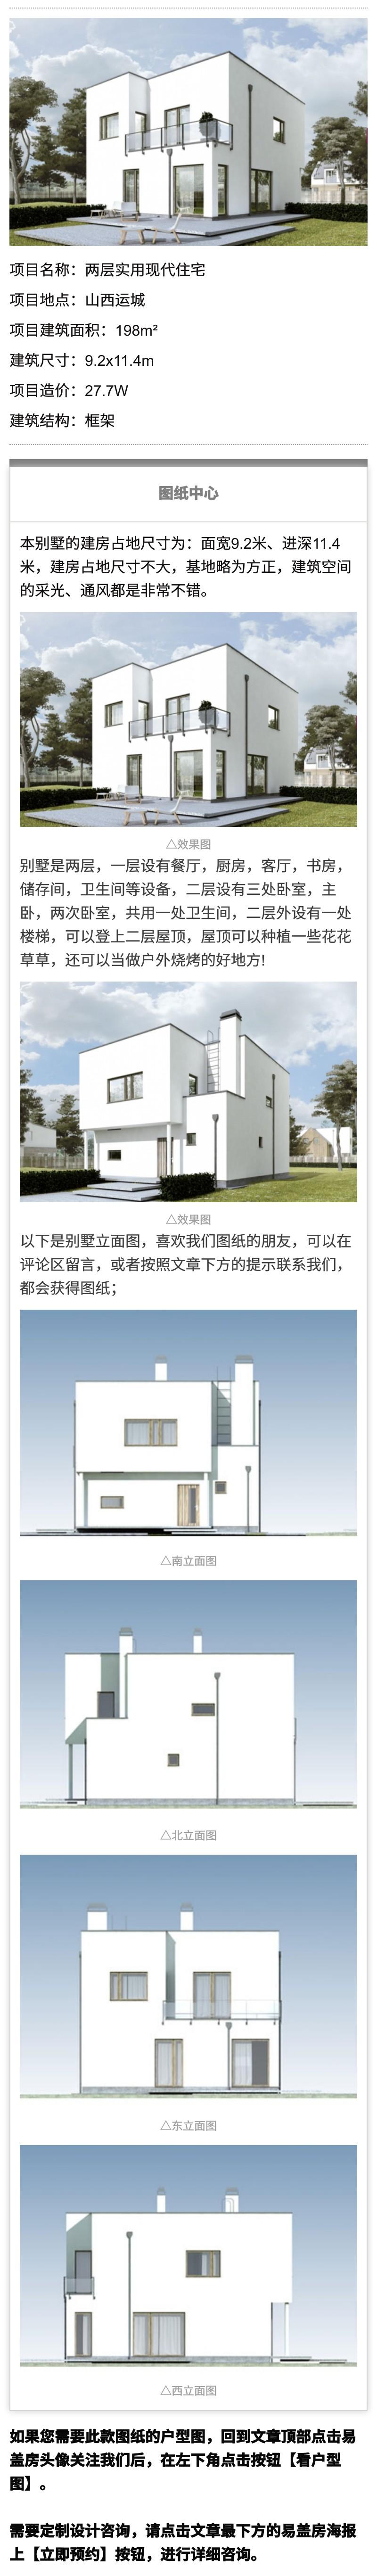 http://img.zhux2.com/editor1520929090182380.jpg